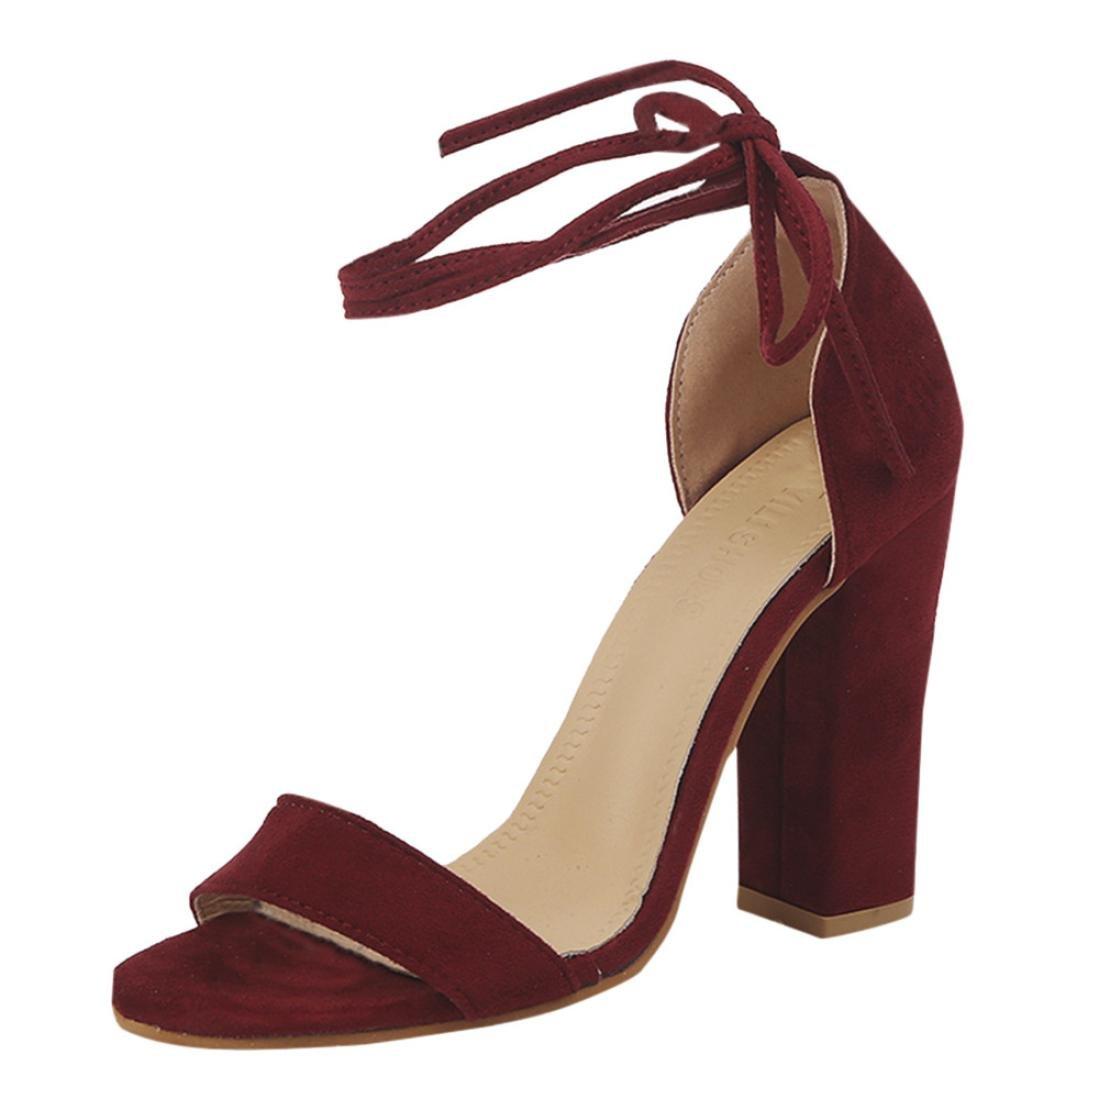 Goodtrade8® Universal Ankle Strap Platform Bohemia Sandal for Women, Wedge Bandage Wedge Women, High Heel Sandals B07CYYM75R 7.5 B(M) US Wine eaf0b8